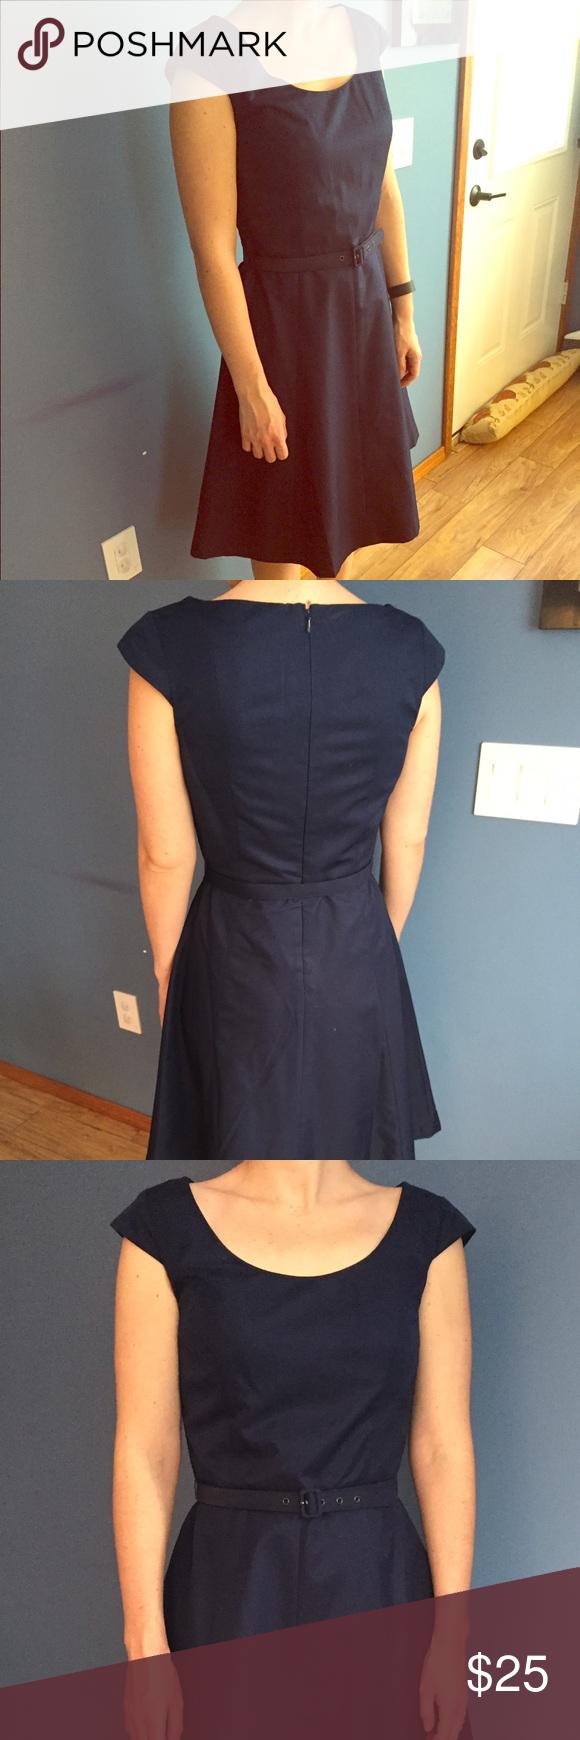 Isaac mizrahi target dress just below knee length semi formal dress